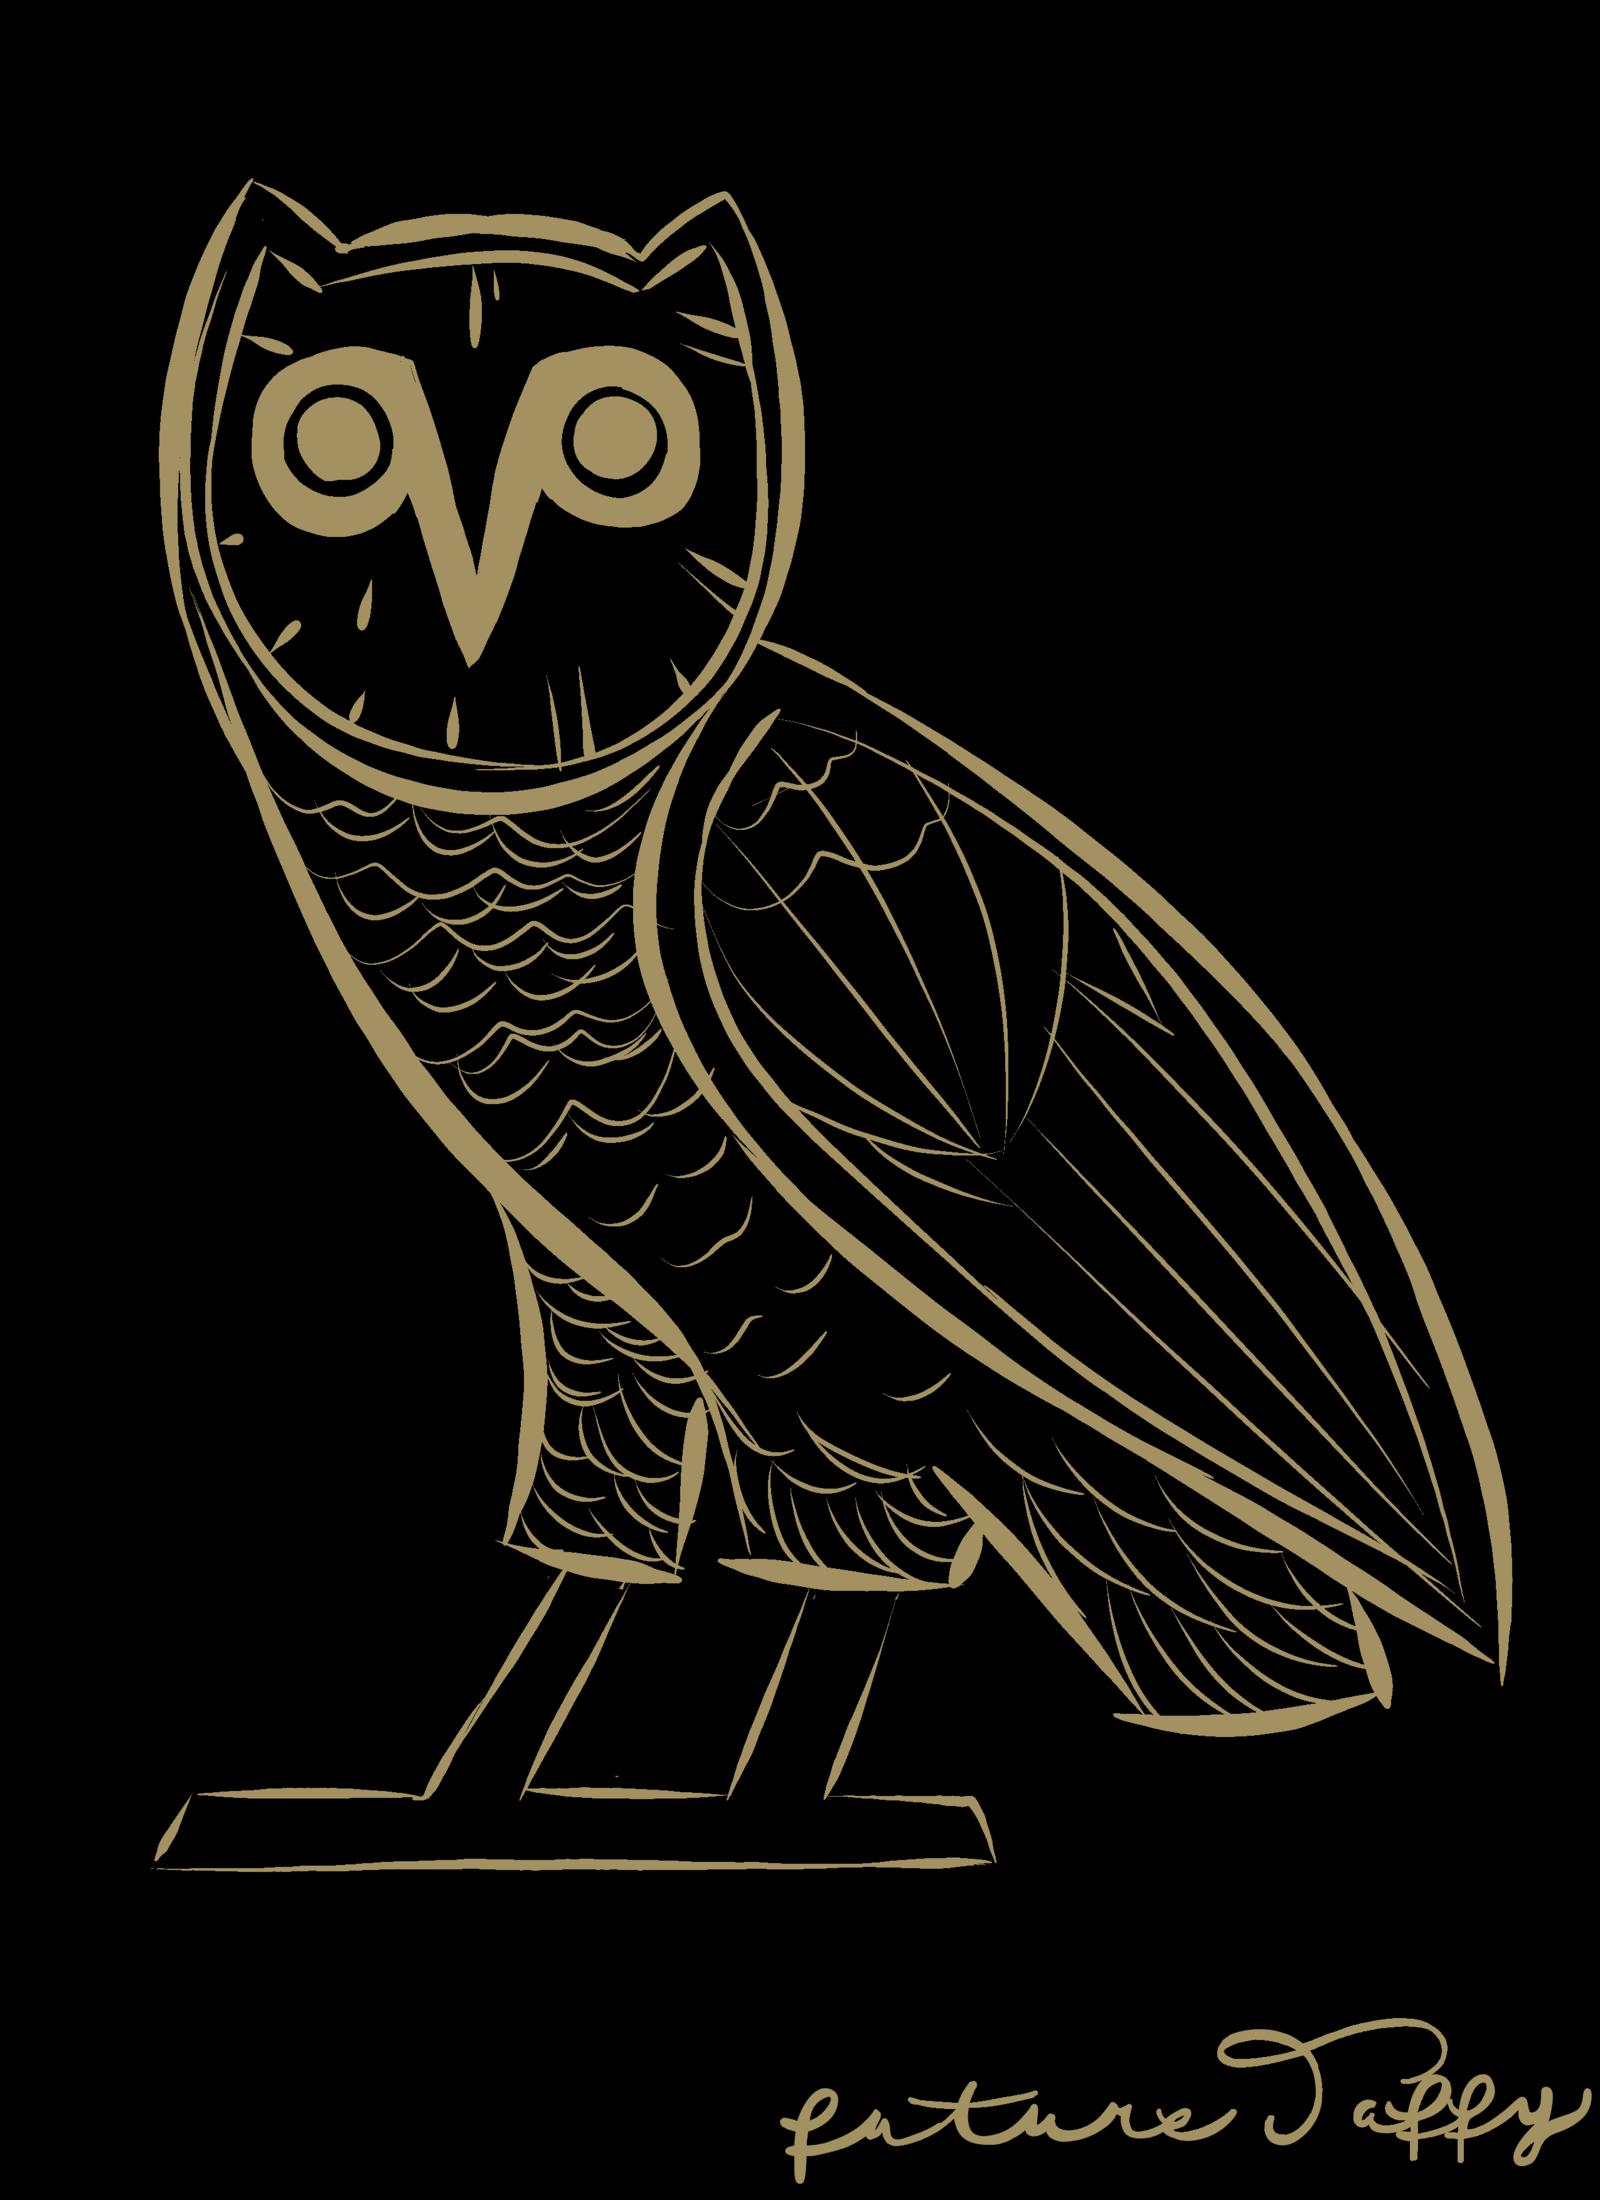 Drake Owl Wallpapers - Top Free Drake Owl Backgrounds ...